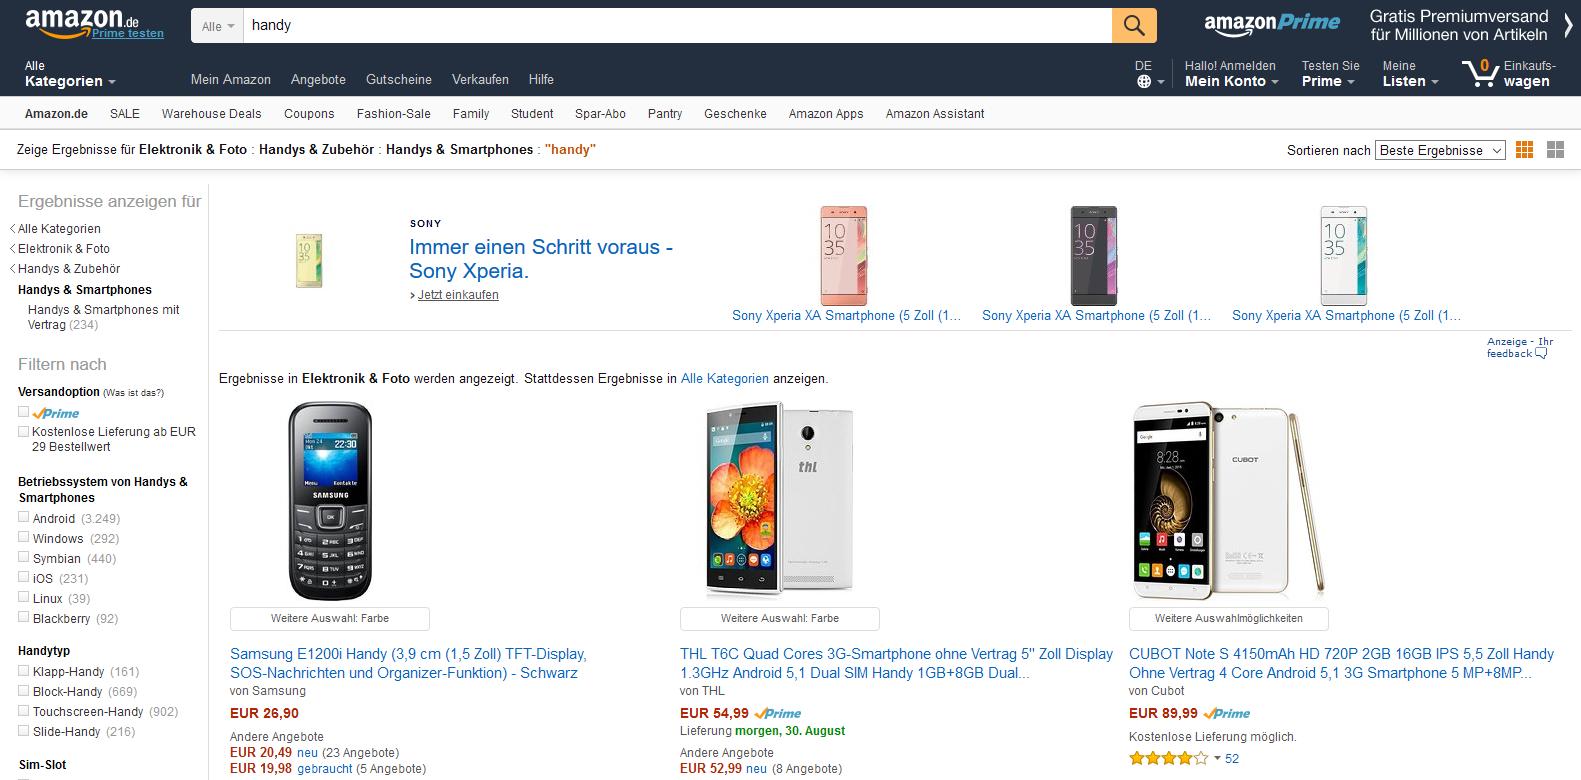 Amazon-Suche: Handy